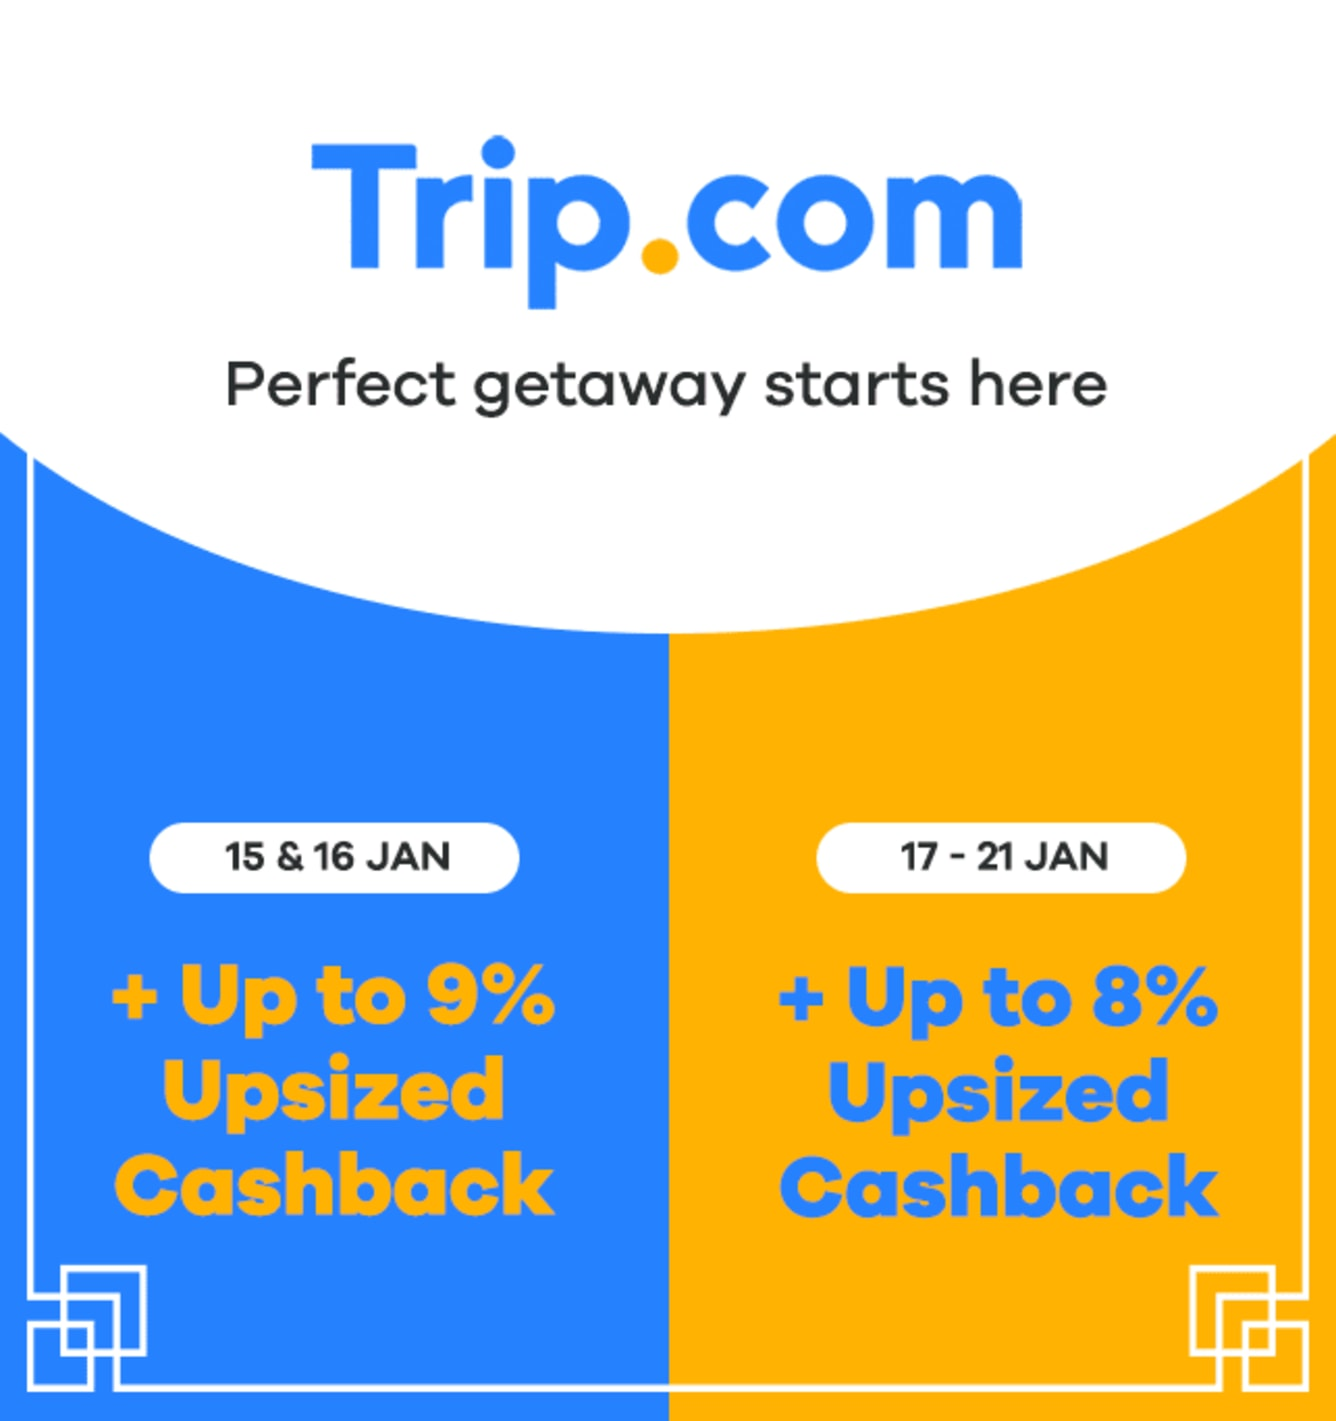 Trip.com <9% Upsized Cashback